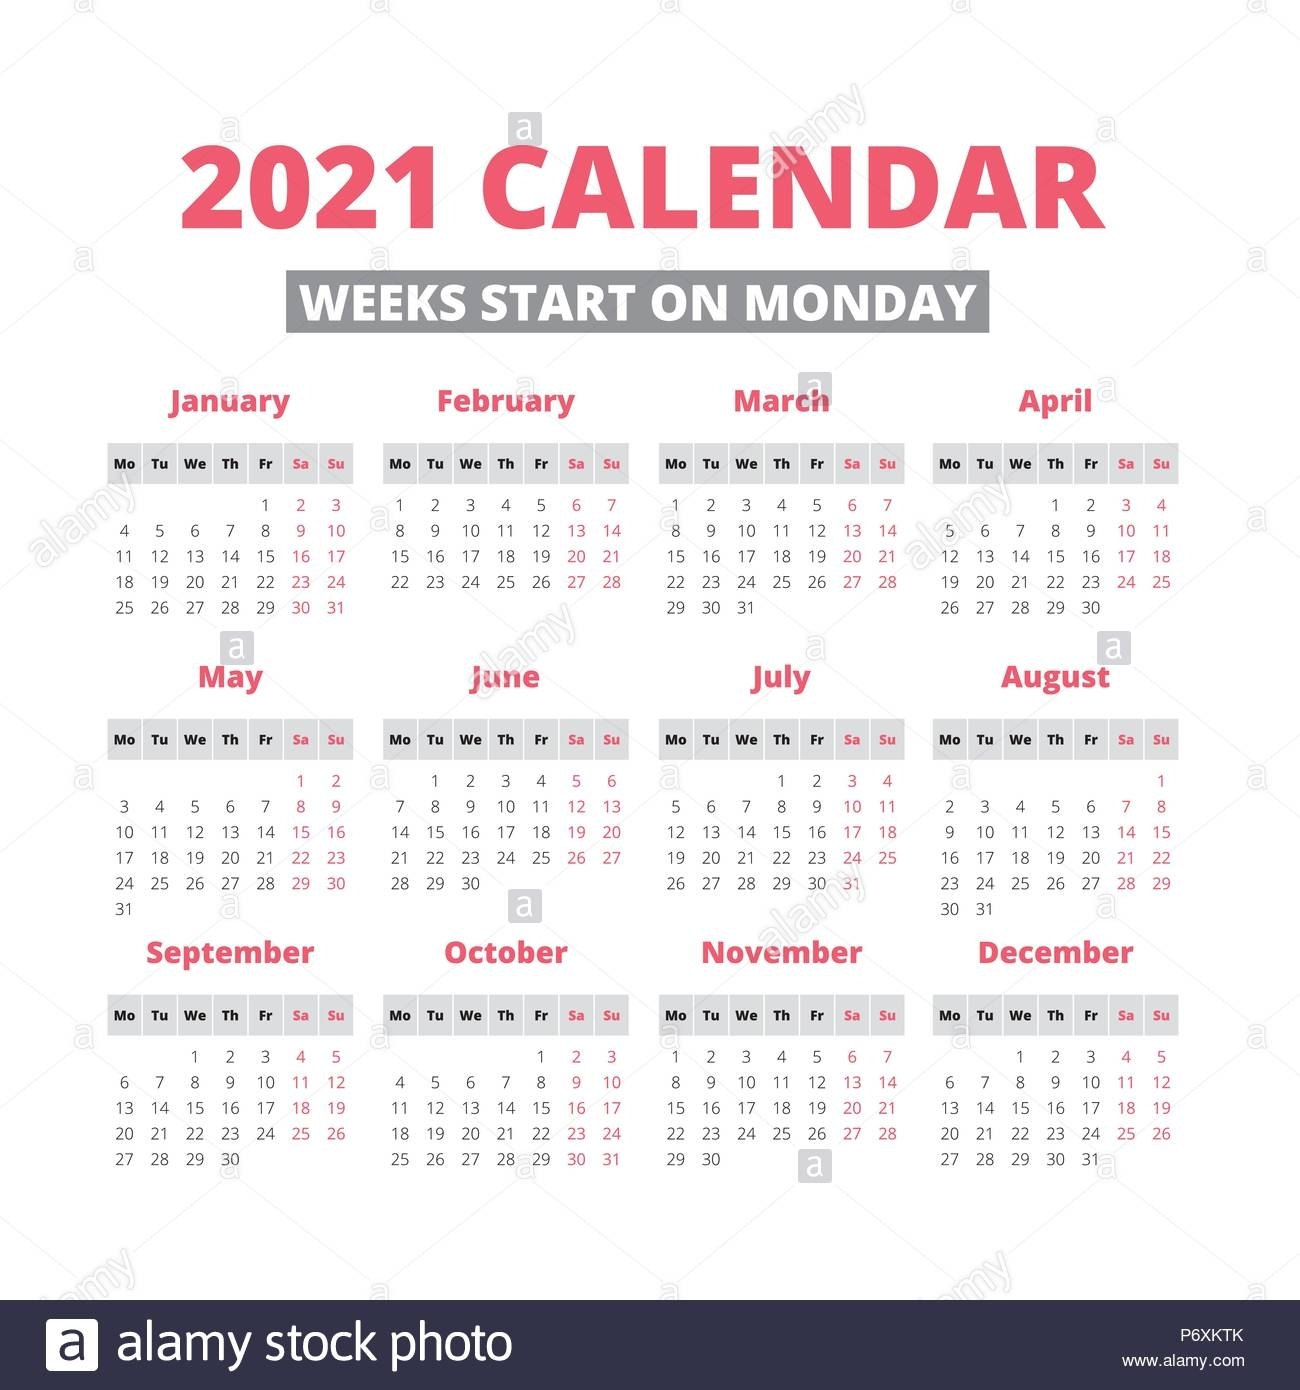 Get Calender 2021 Week Start Monday